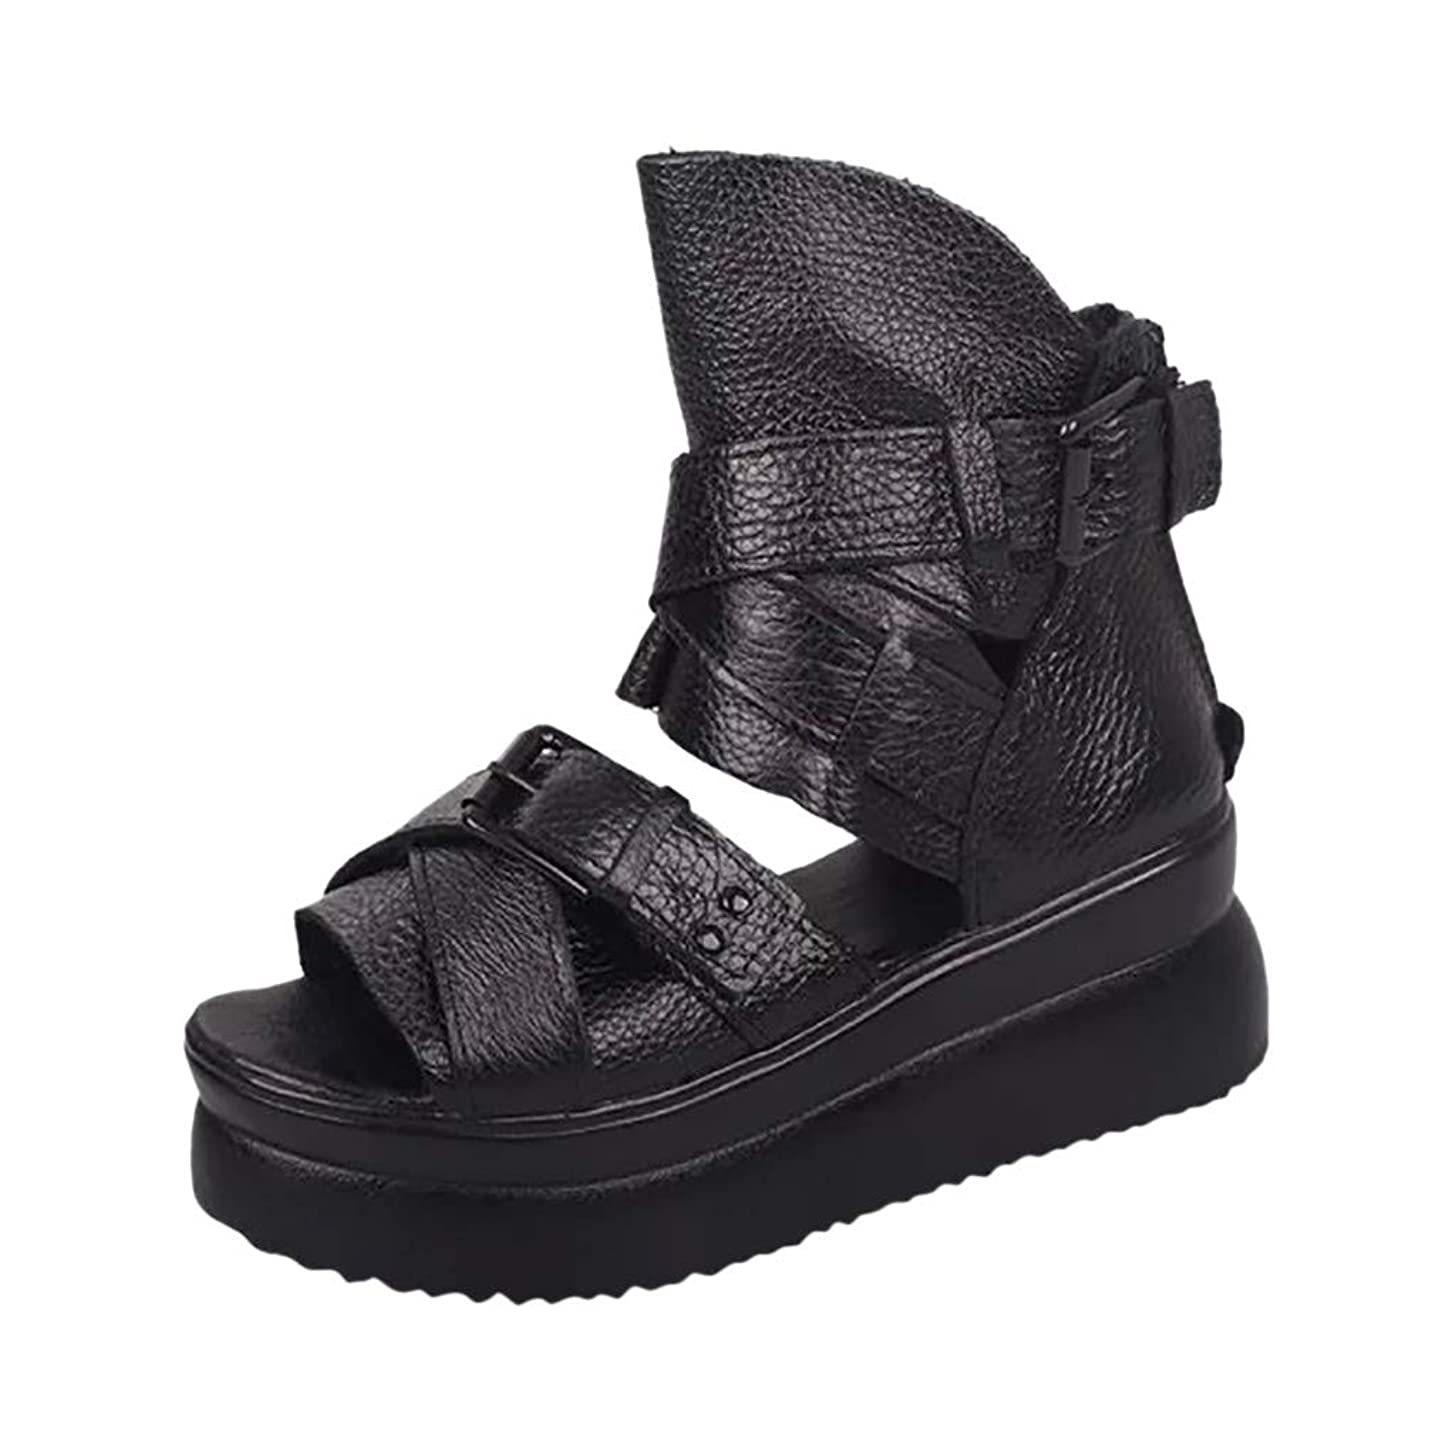 Womens Sandals for Women Huizhuangshigong Women's Summer Roman Fish Mouth Shoes Thick Bottom Cake Rivet Wedge Sandals(43, Black)